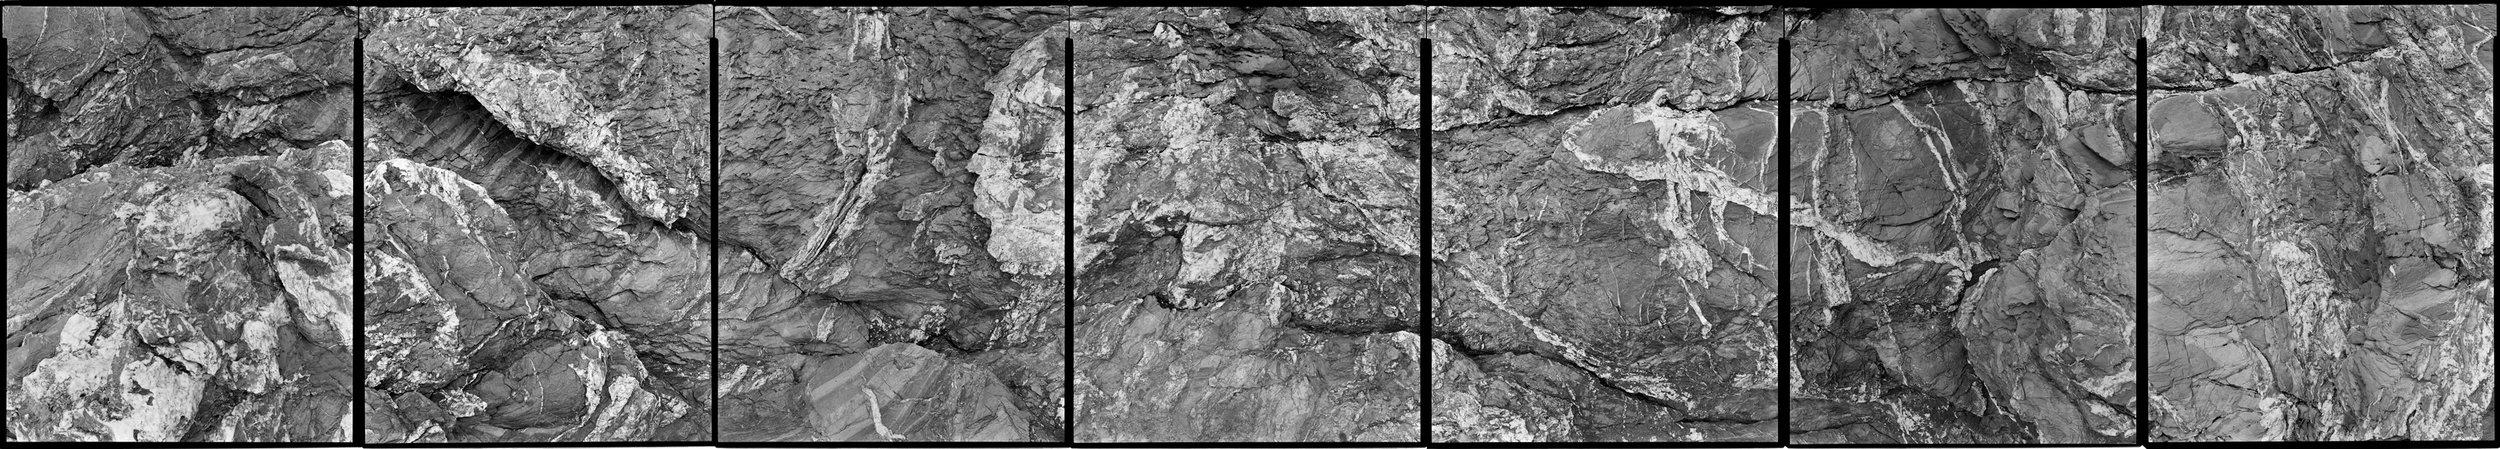 Untitled 7 panel piece ( Beavertail 5-29-02-B ), 2002